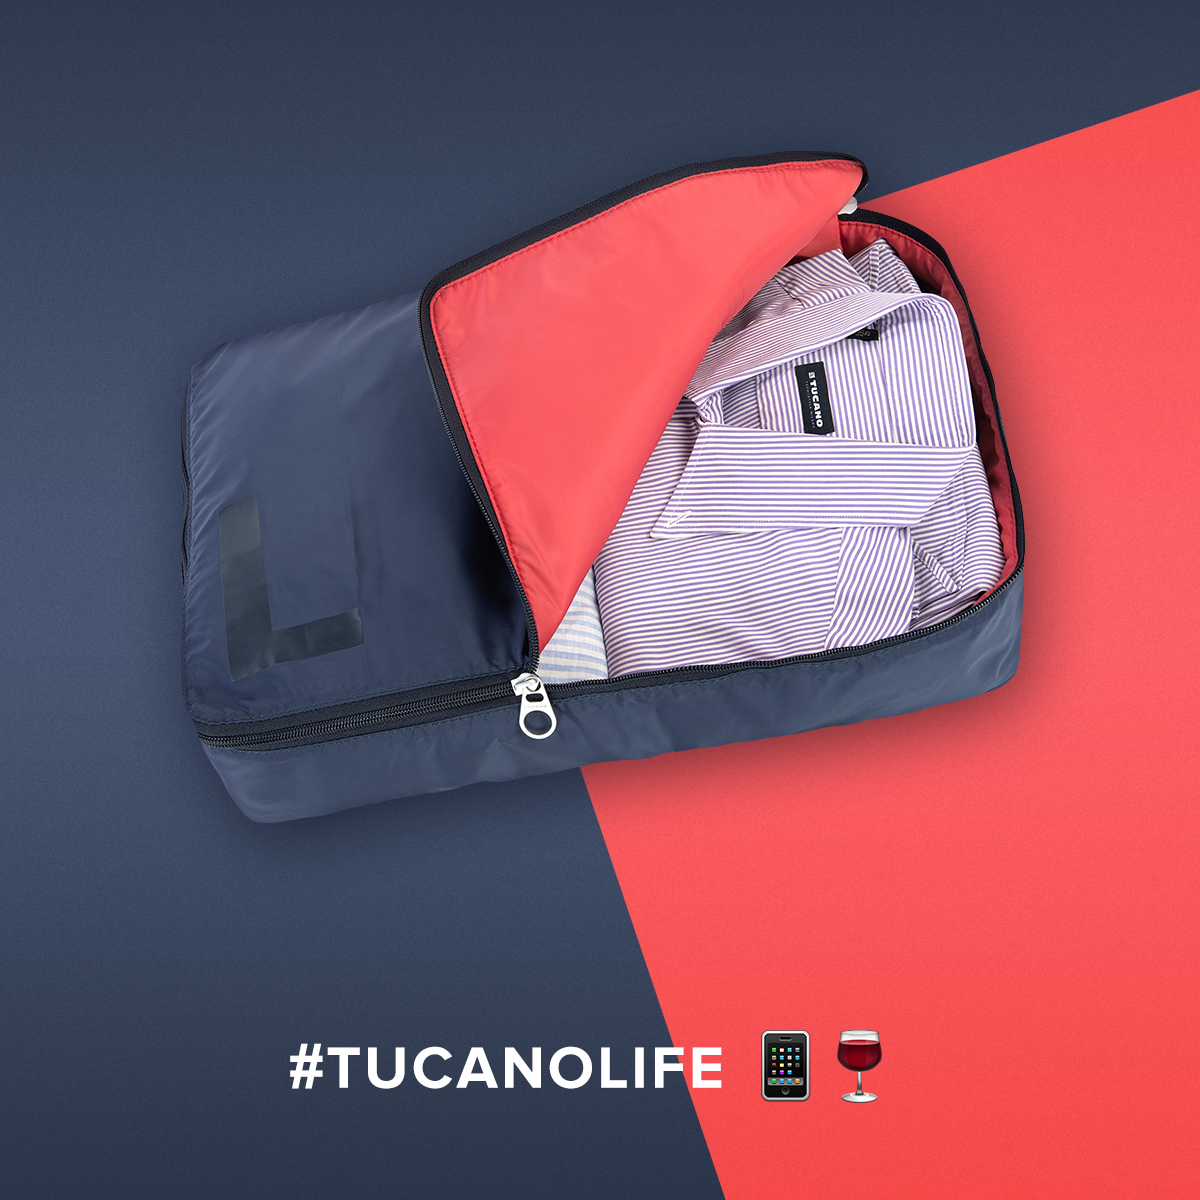 tucano_lug13-19_03